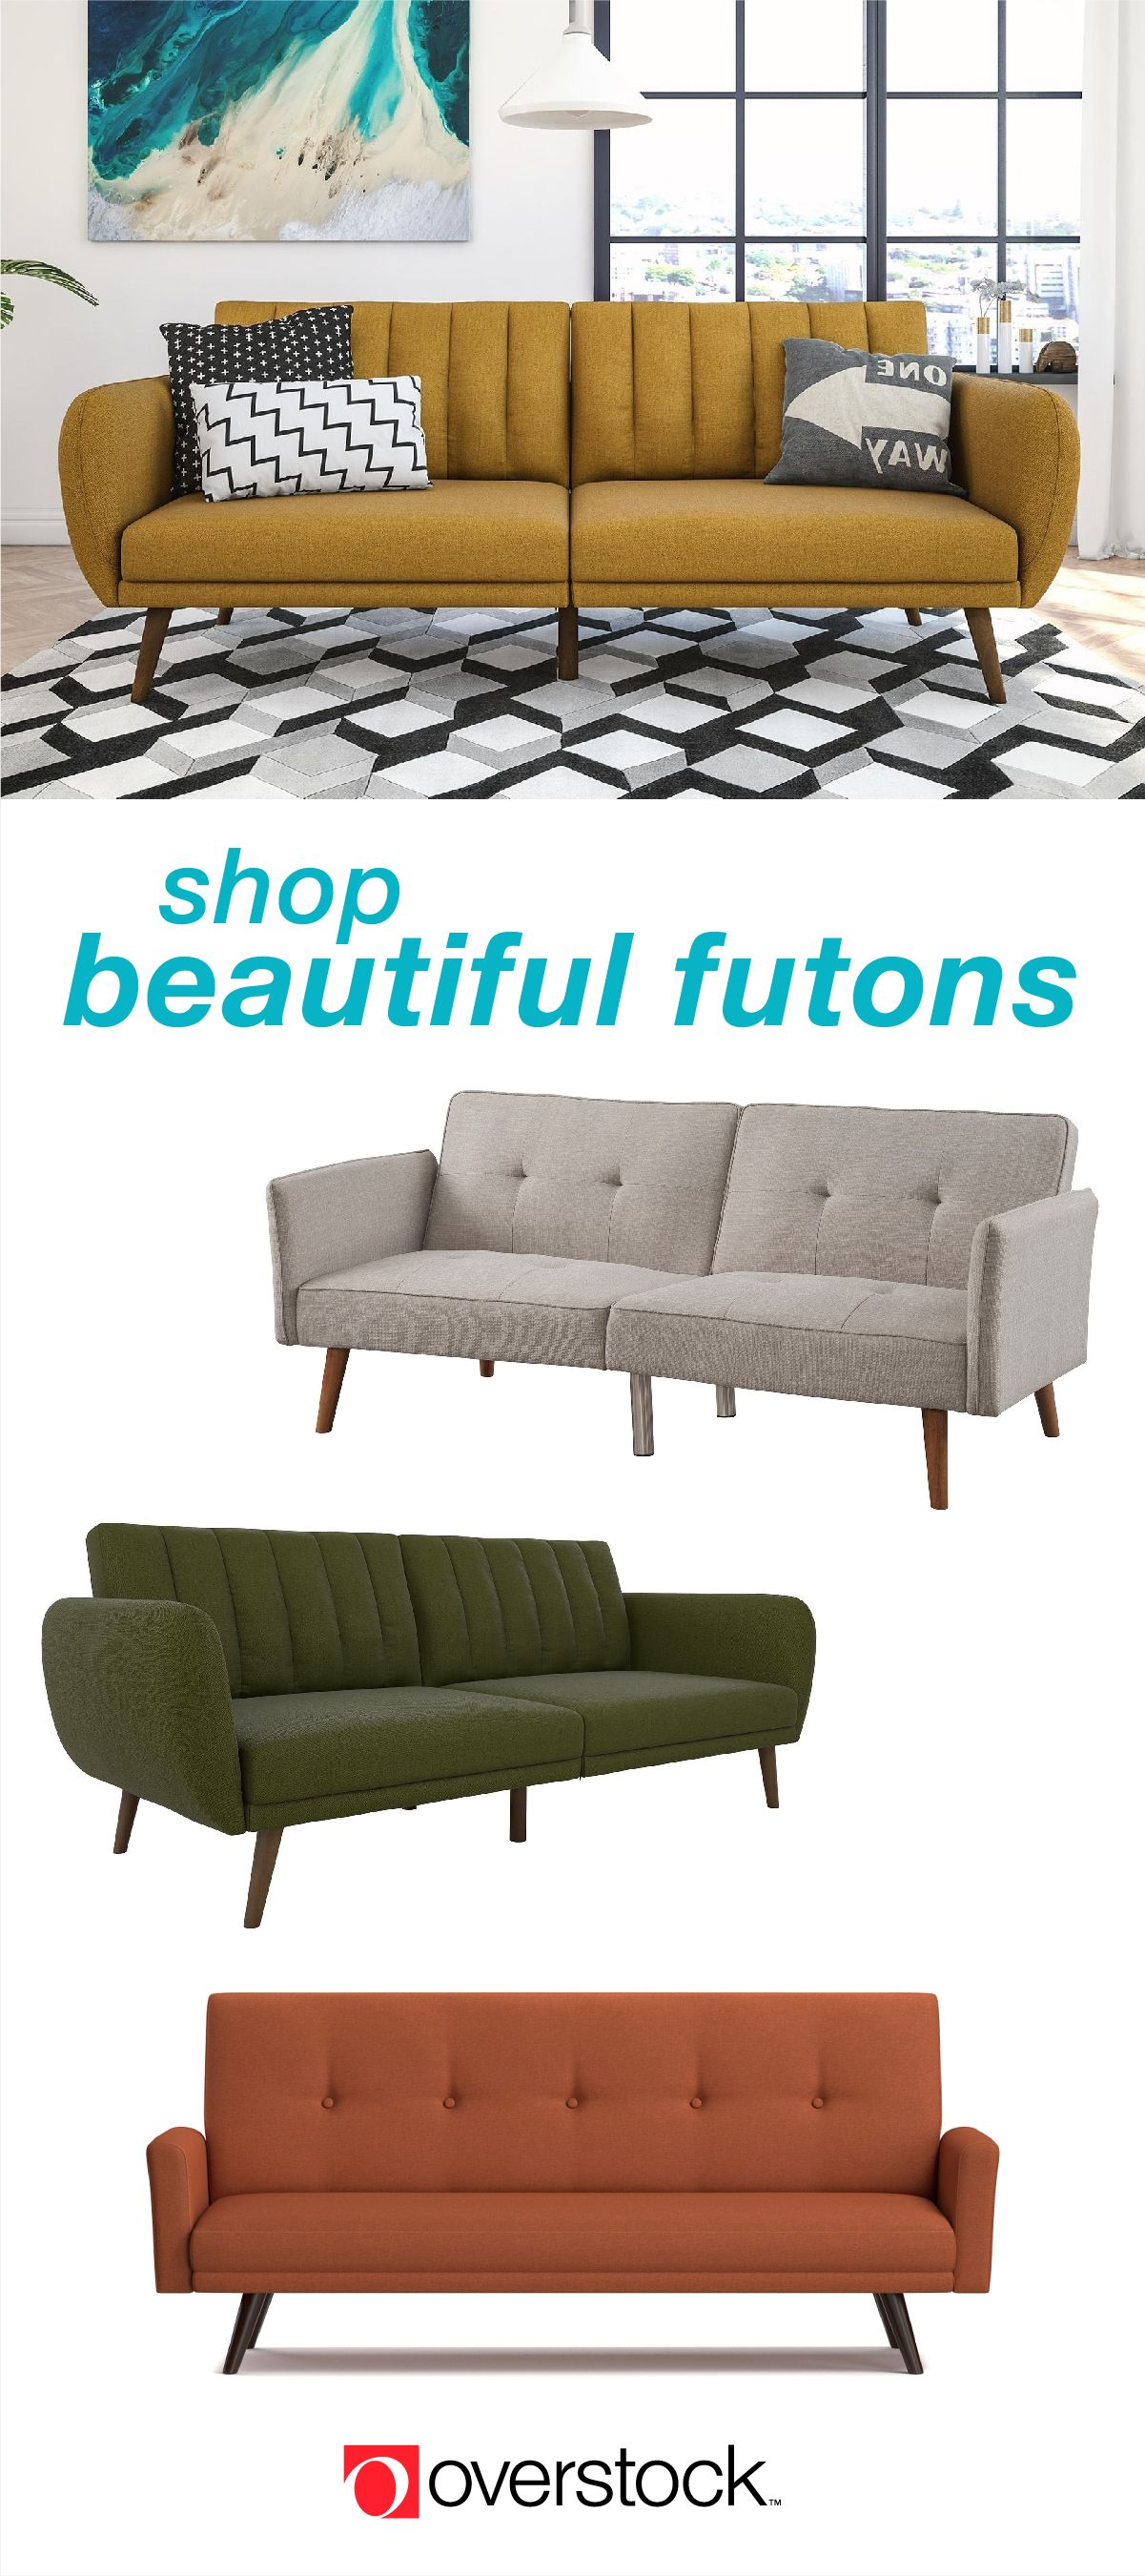 Shop Beautiful Futons Stylish Bedroom Furniture Pallet Furniture Living Room Stylish Bedroom